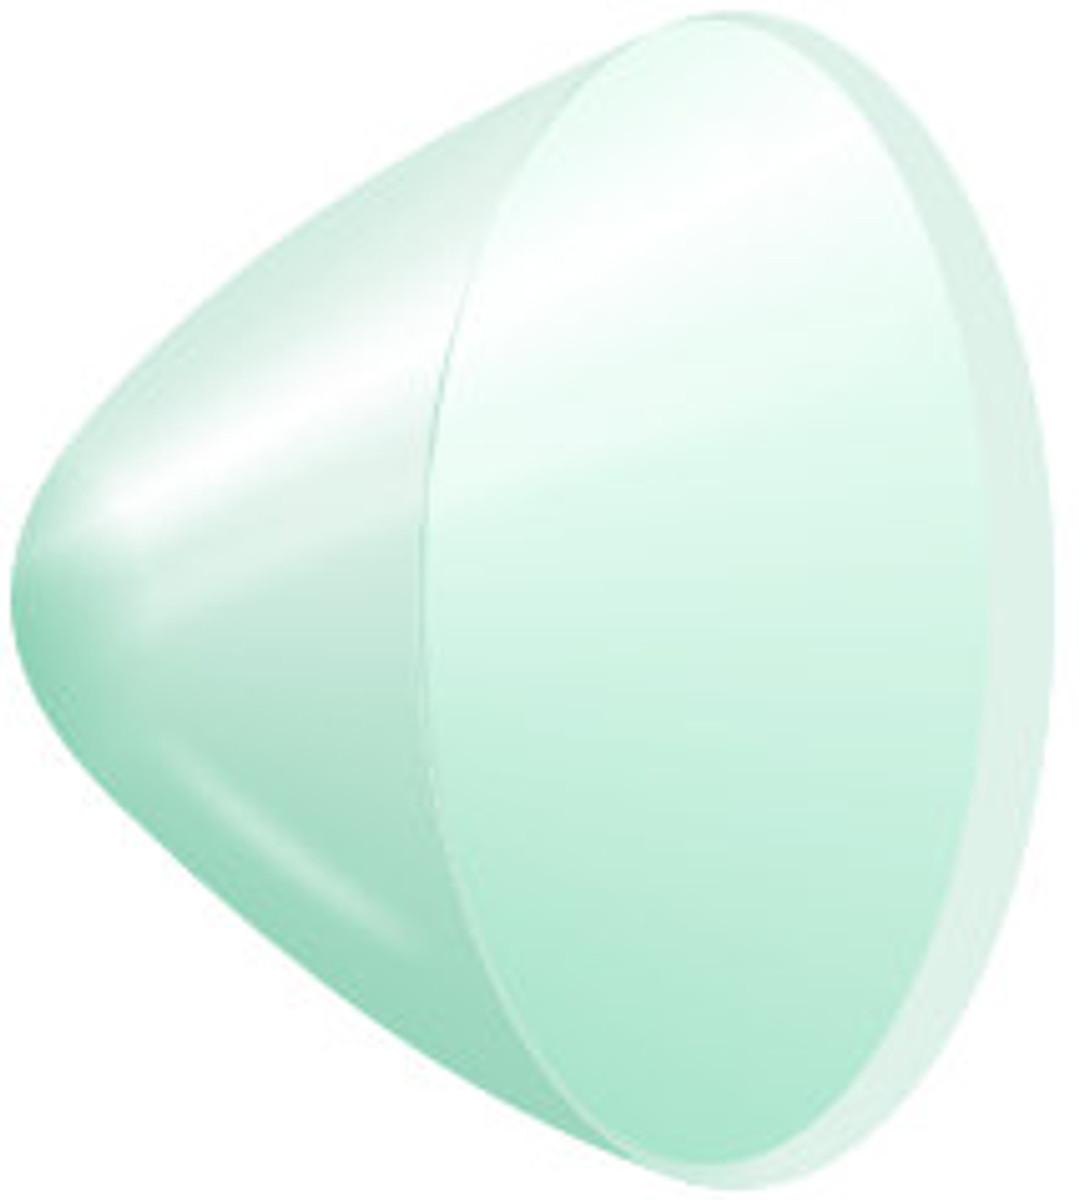 Beechcraft Stinger lens from Knots 2U. Replaces Beechcraft part 35-440010-13, 002-440033-23, 002-440033-23